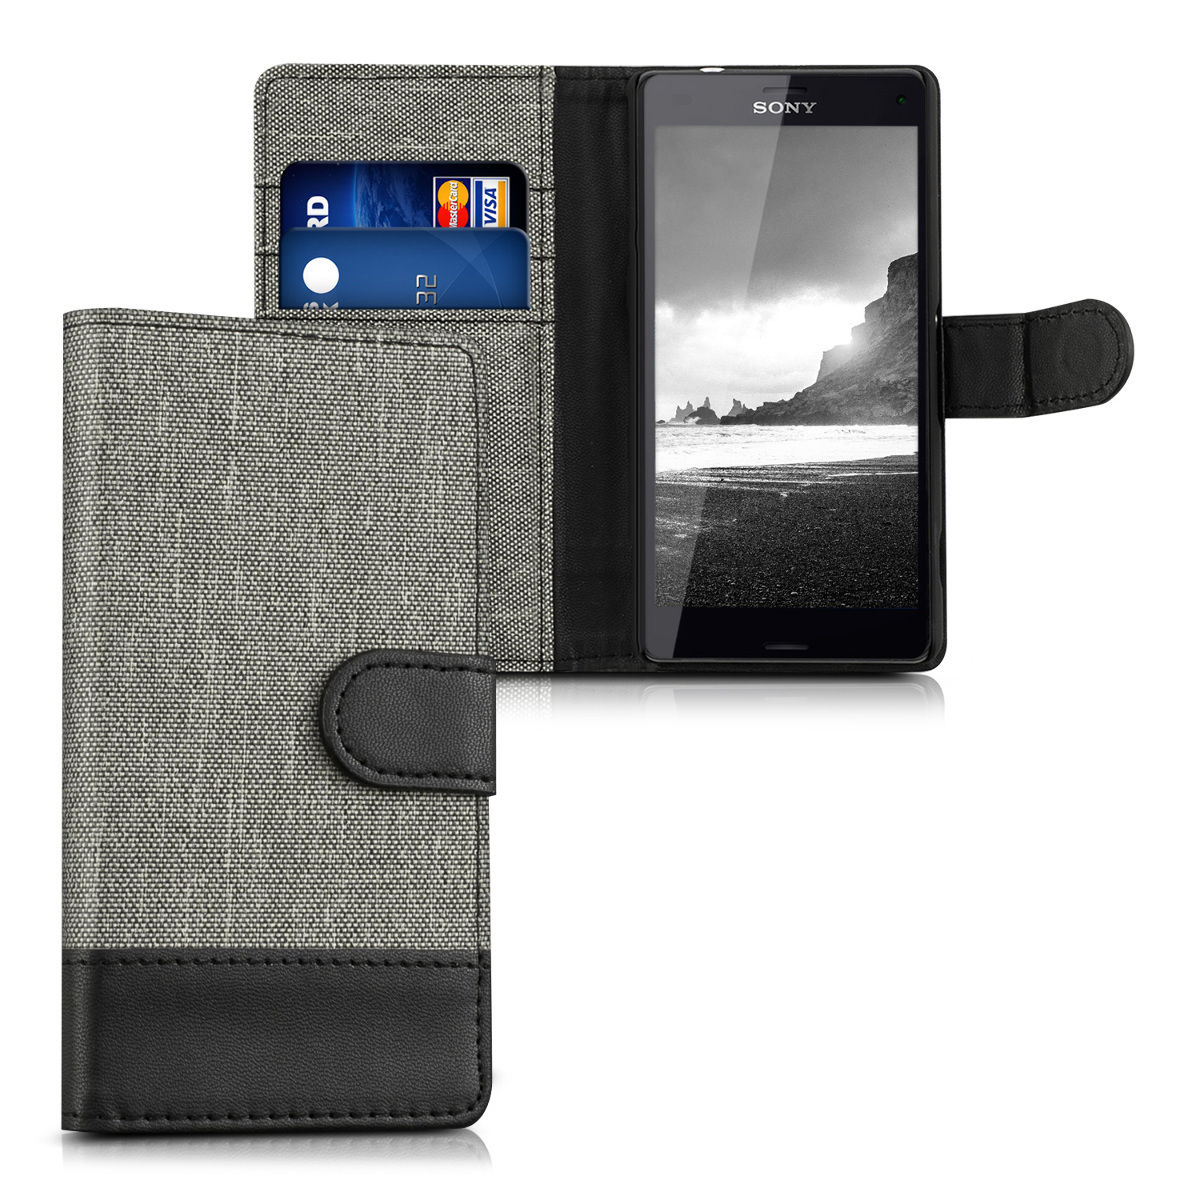 Pouzdro pro Sony Xperia Z3 Compact šedé